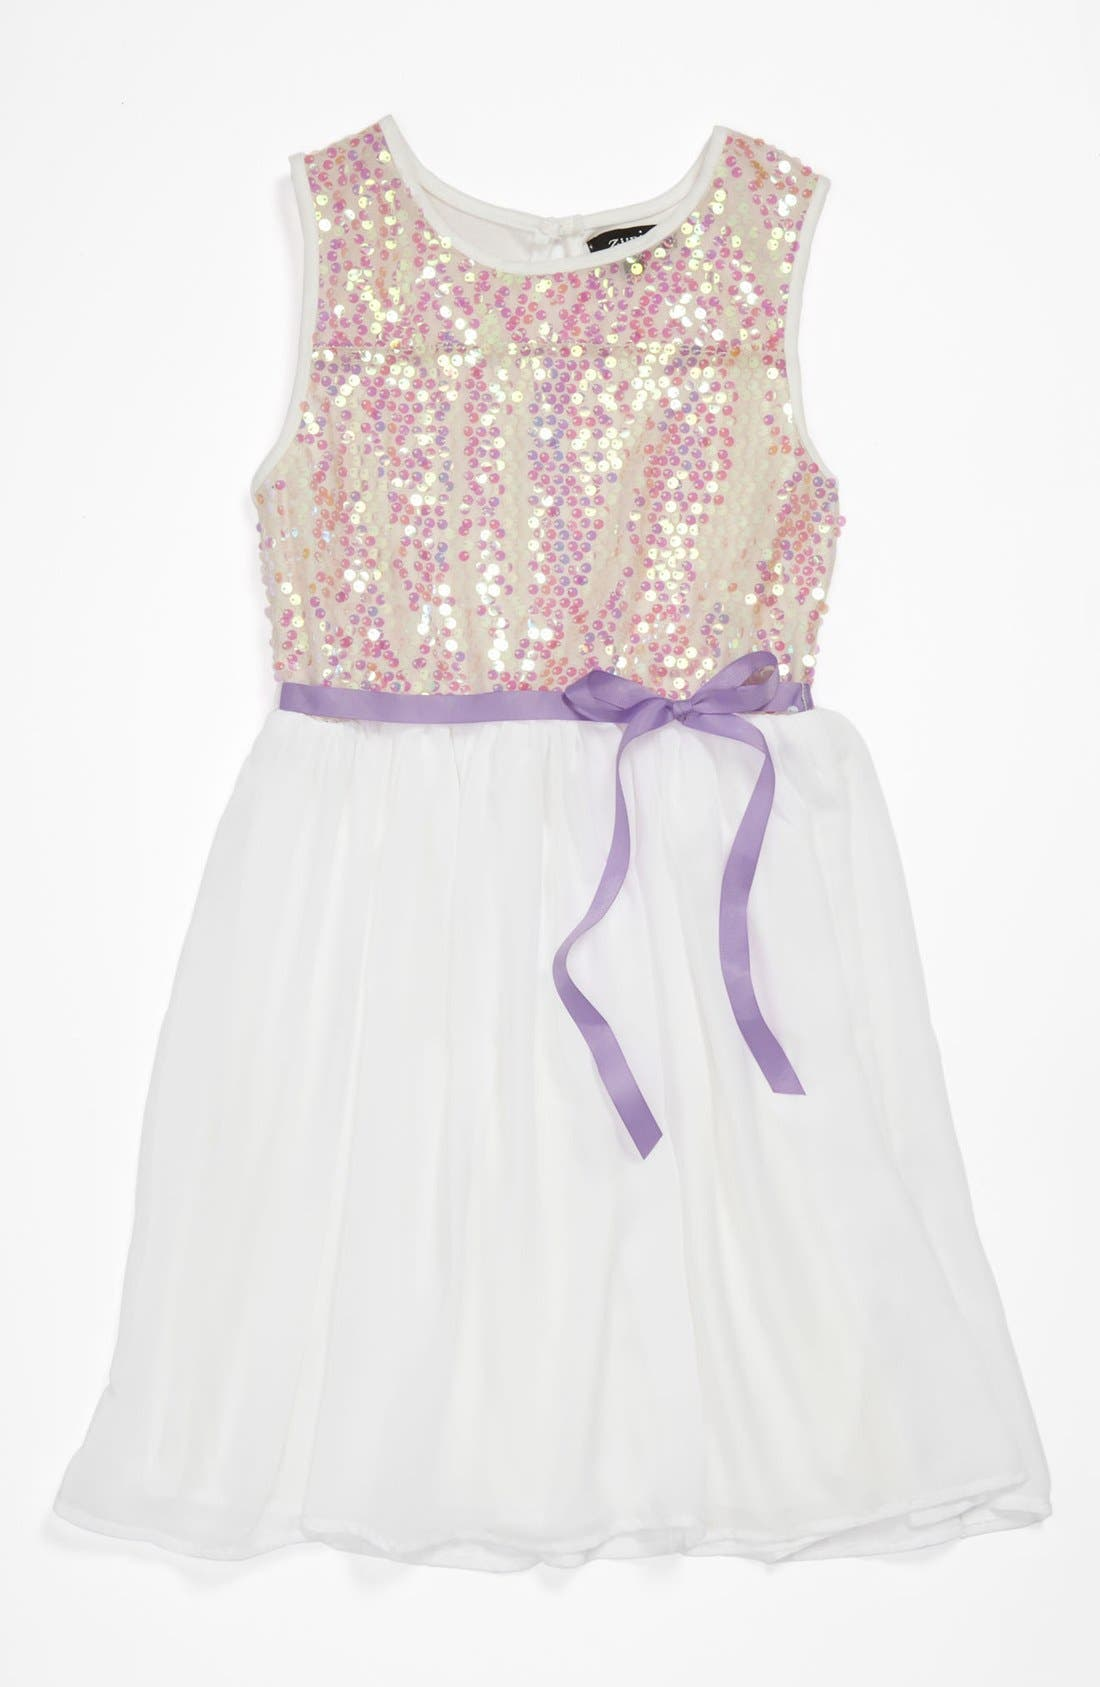 Main Image - Zunie Sleeveless Skater Dress (Big Girls)